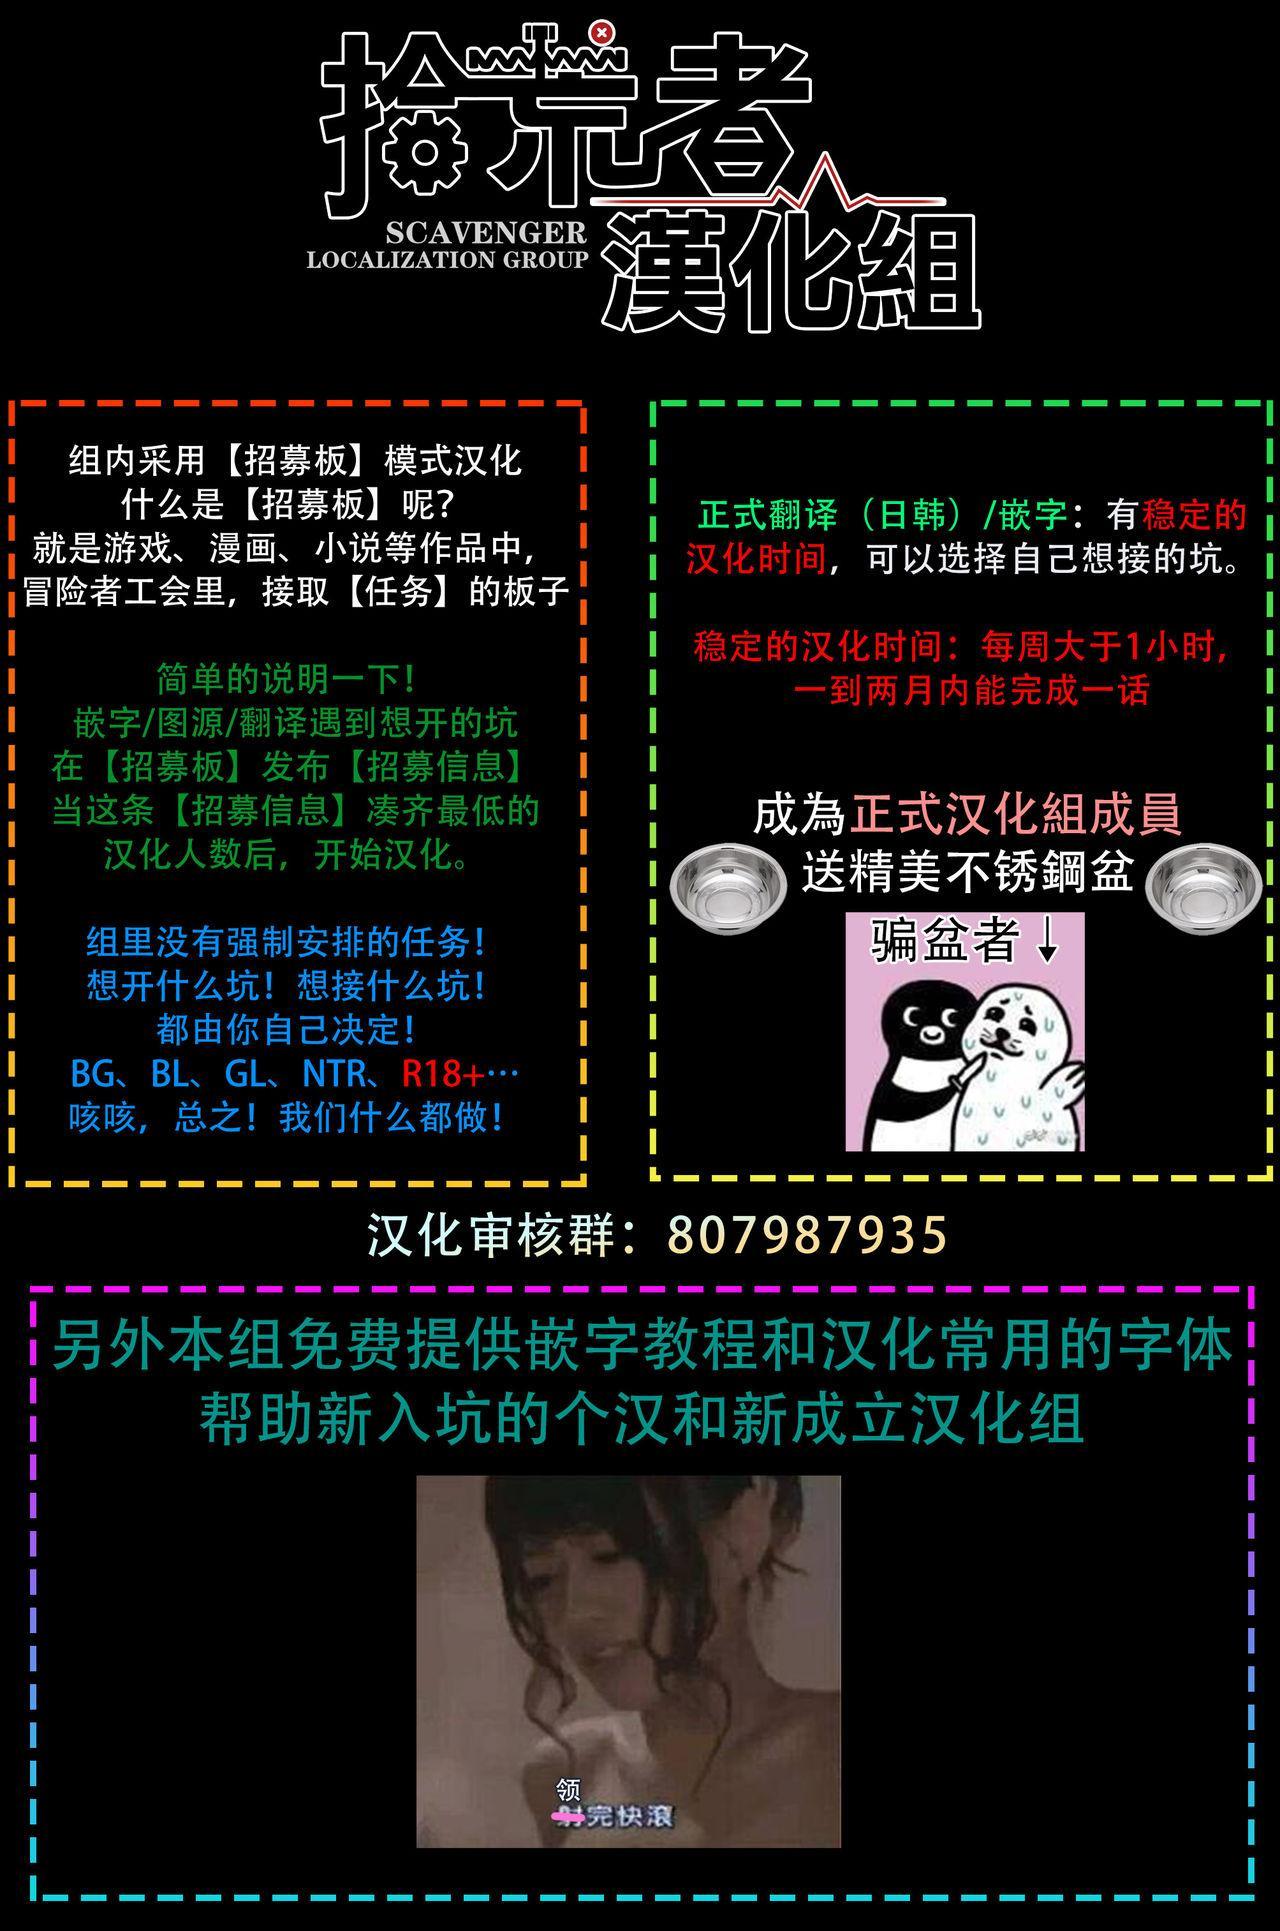 [Utata Hakuto] Houkago Virginity - Virginity afterschool 1-3 [Chinese] [拾荒者汉化组] [Digital] 102